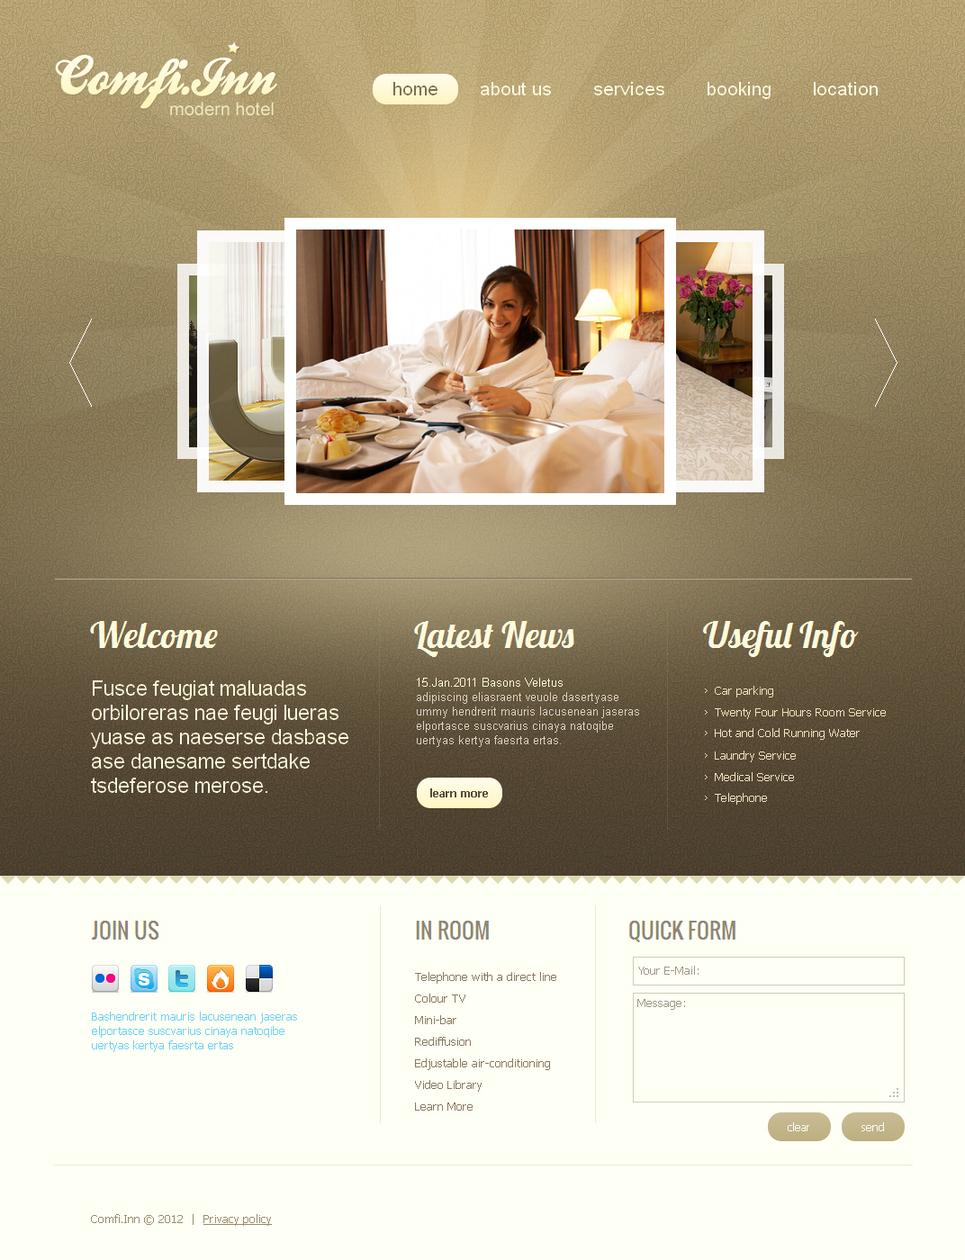 Light Brown Website Template for Hotels - image